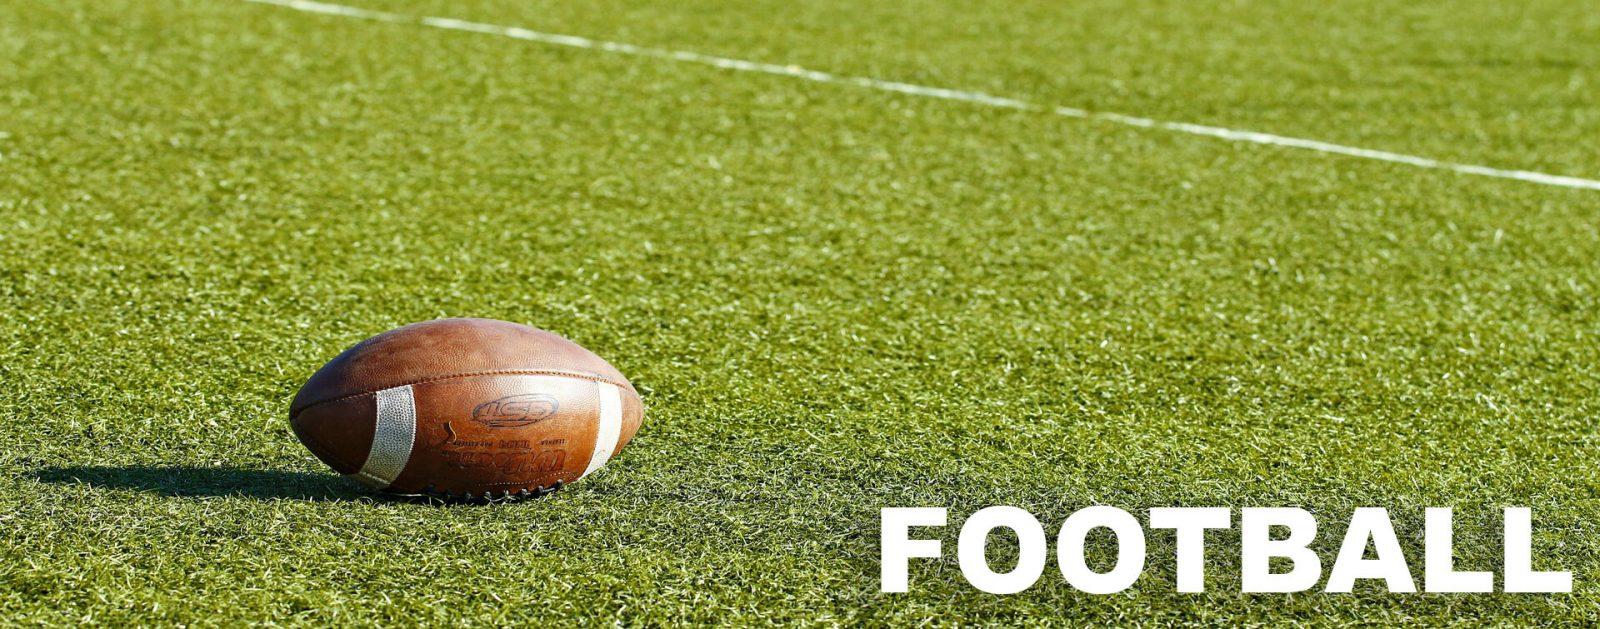 football_banner